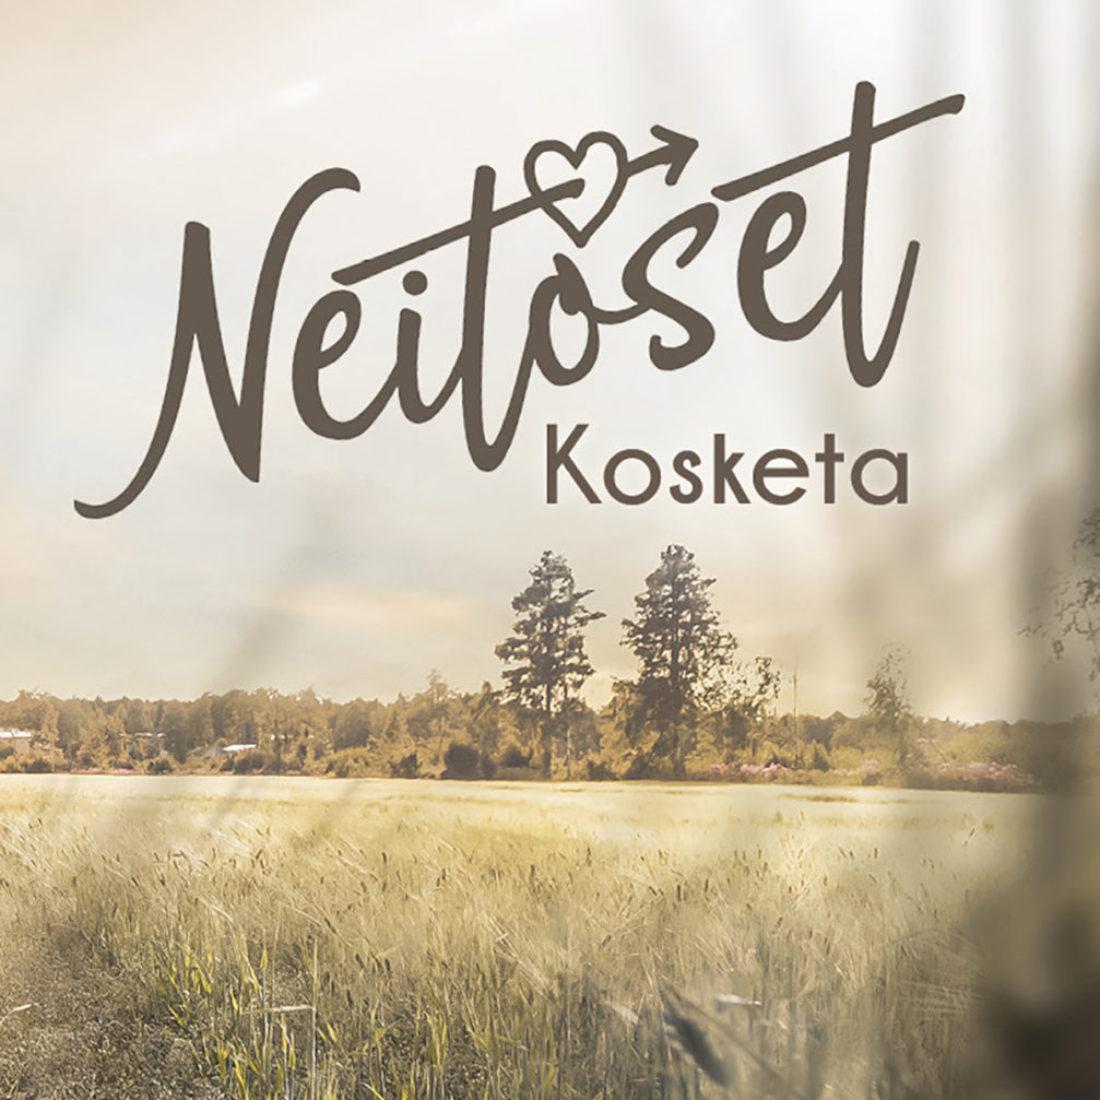 NEITOSET_ Kosketa_1200x1200